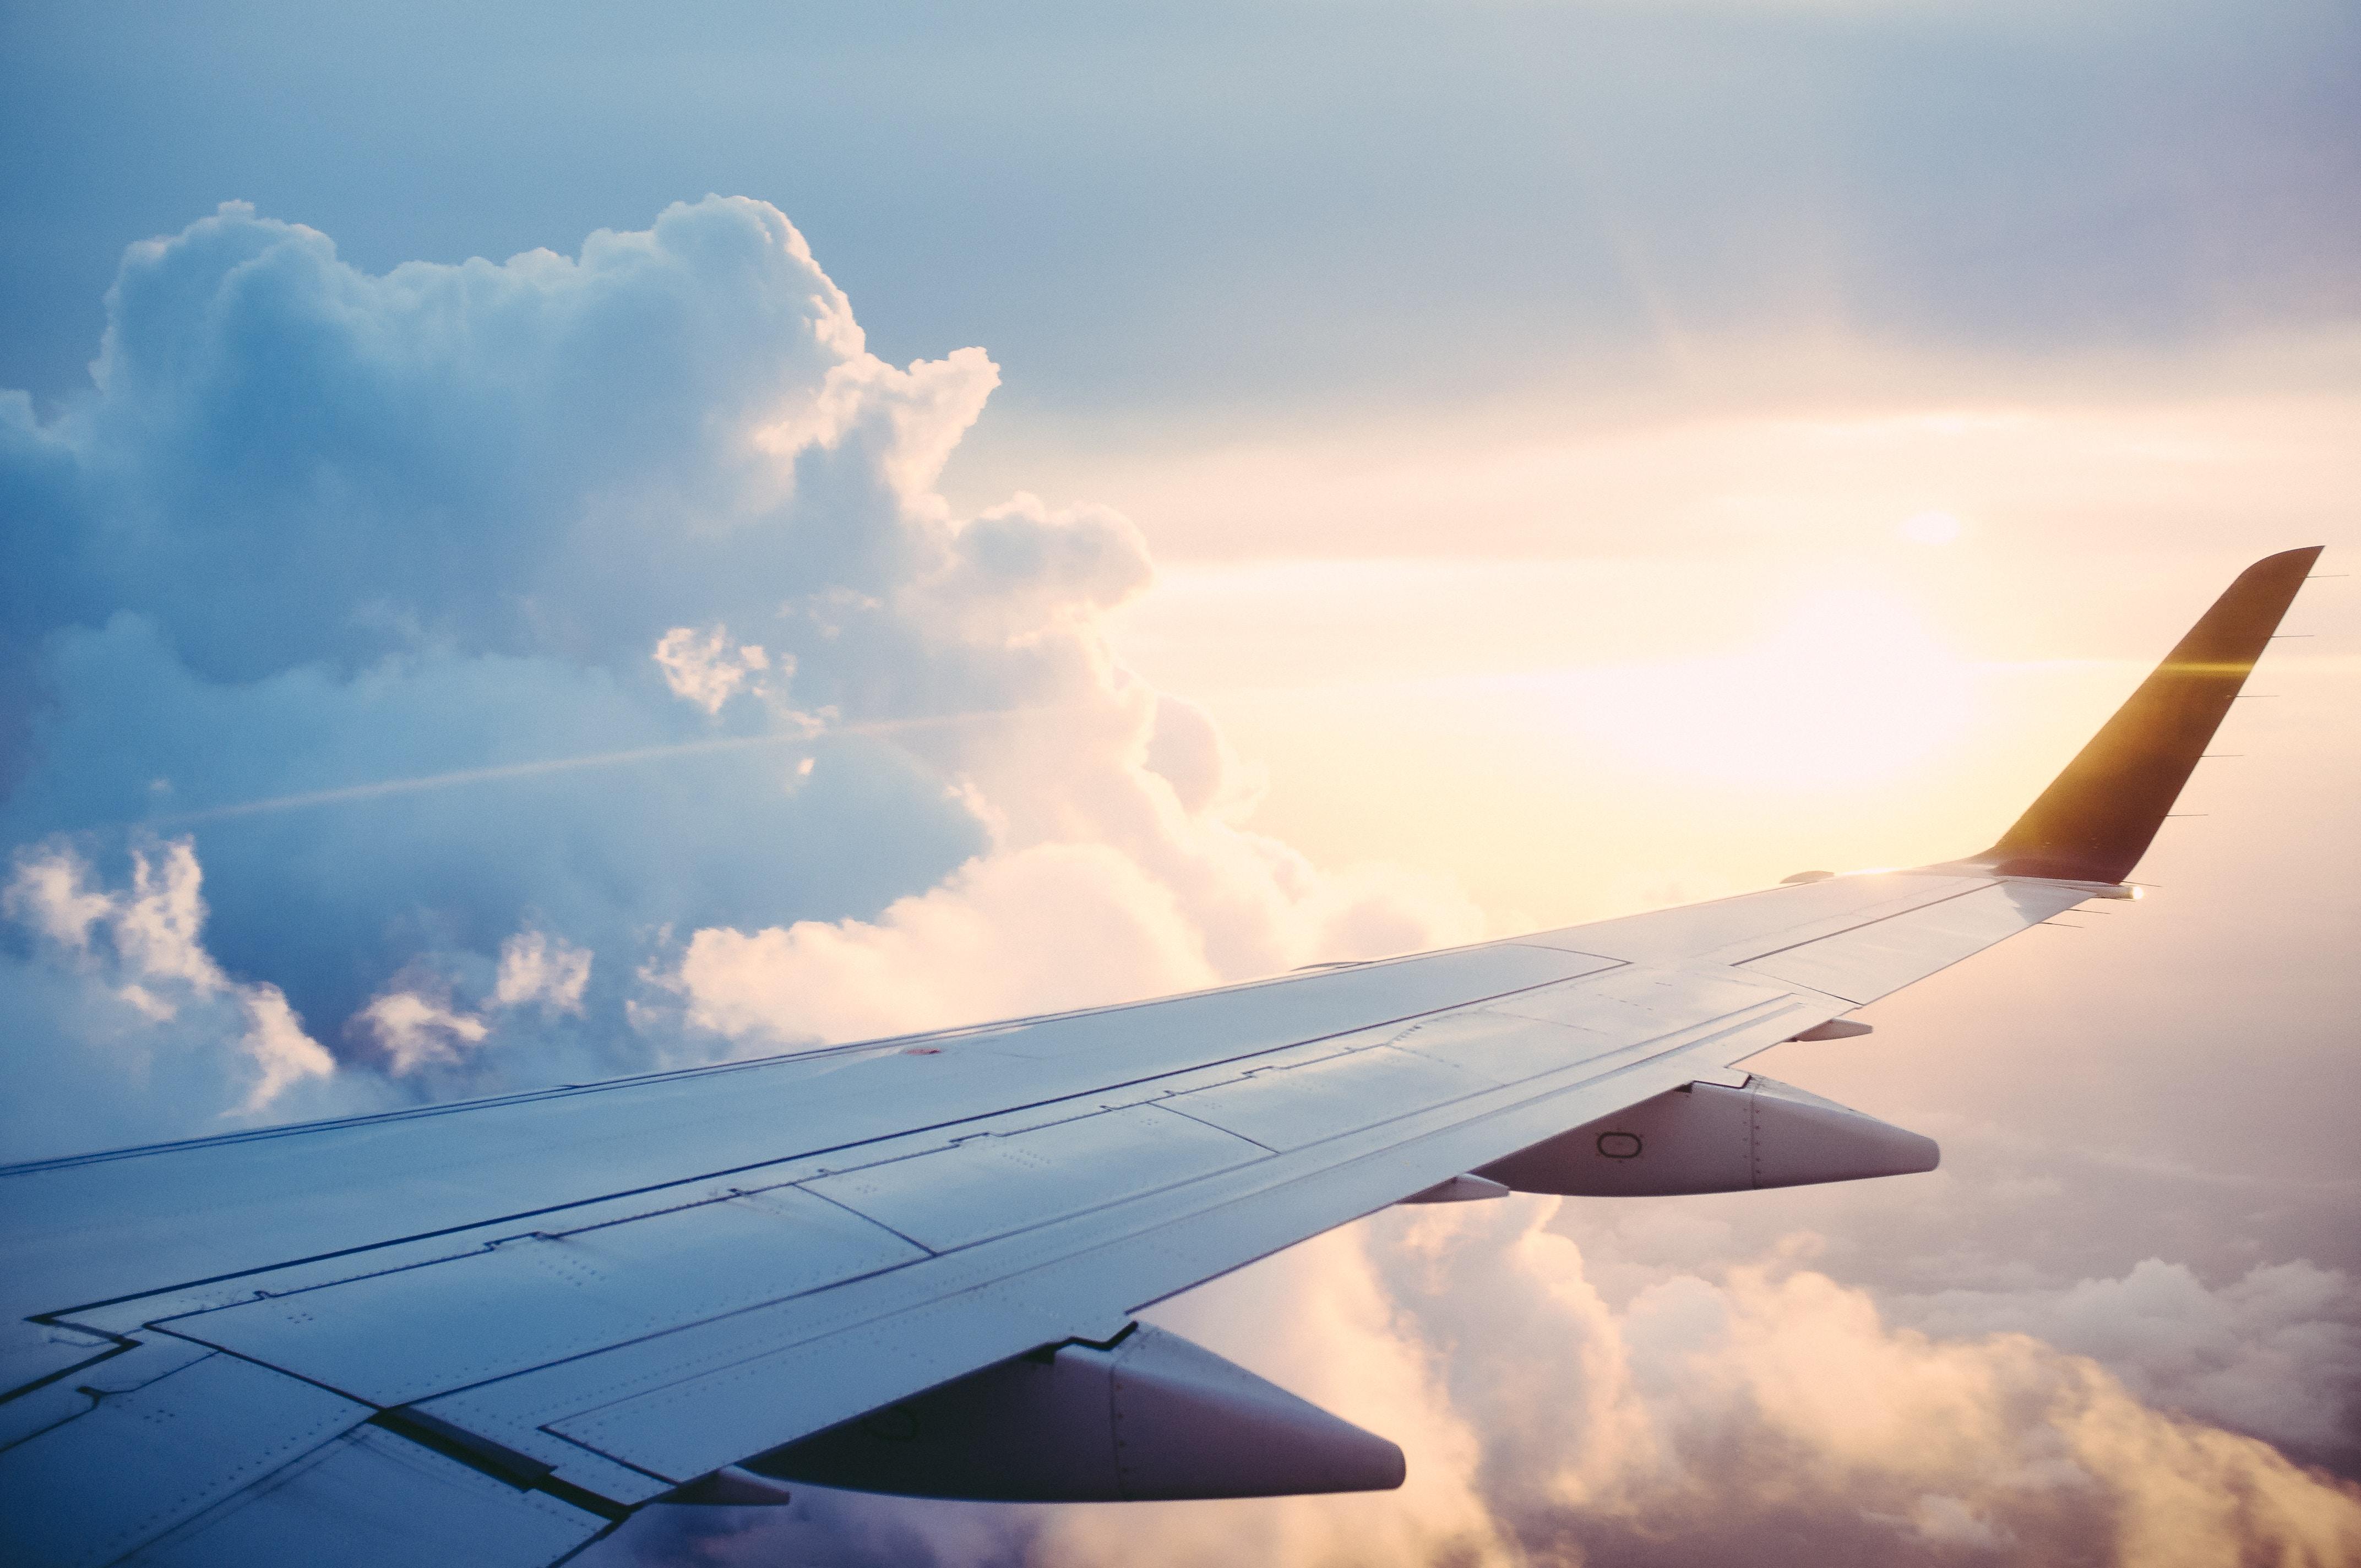 Airplane airplane stories